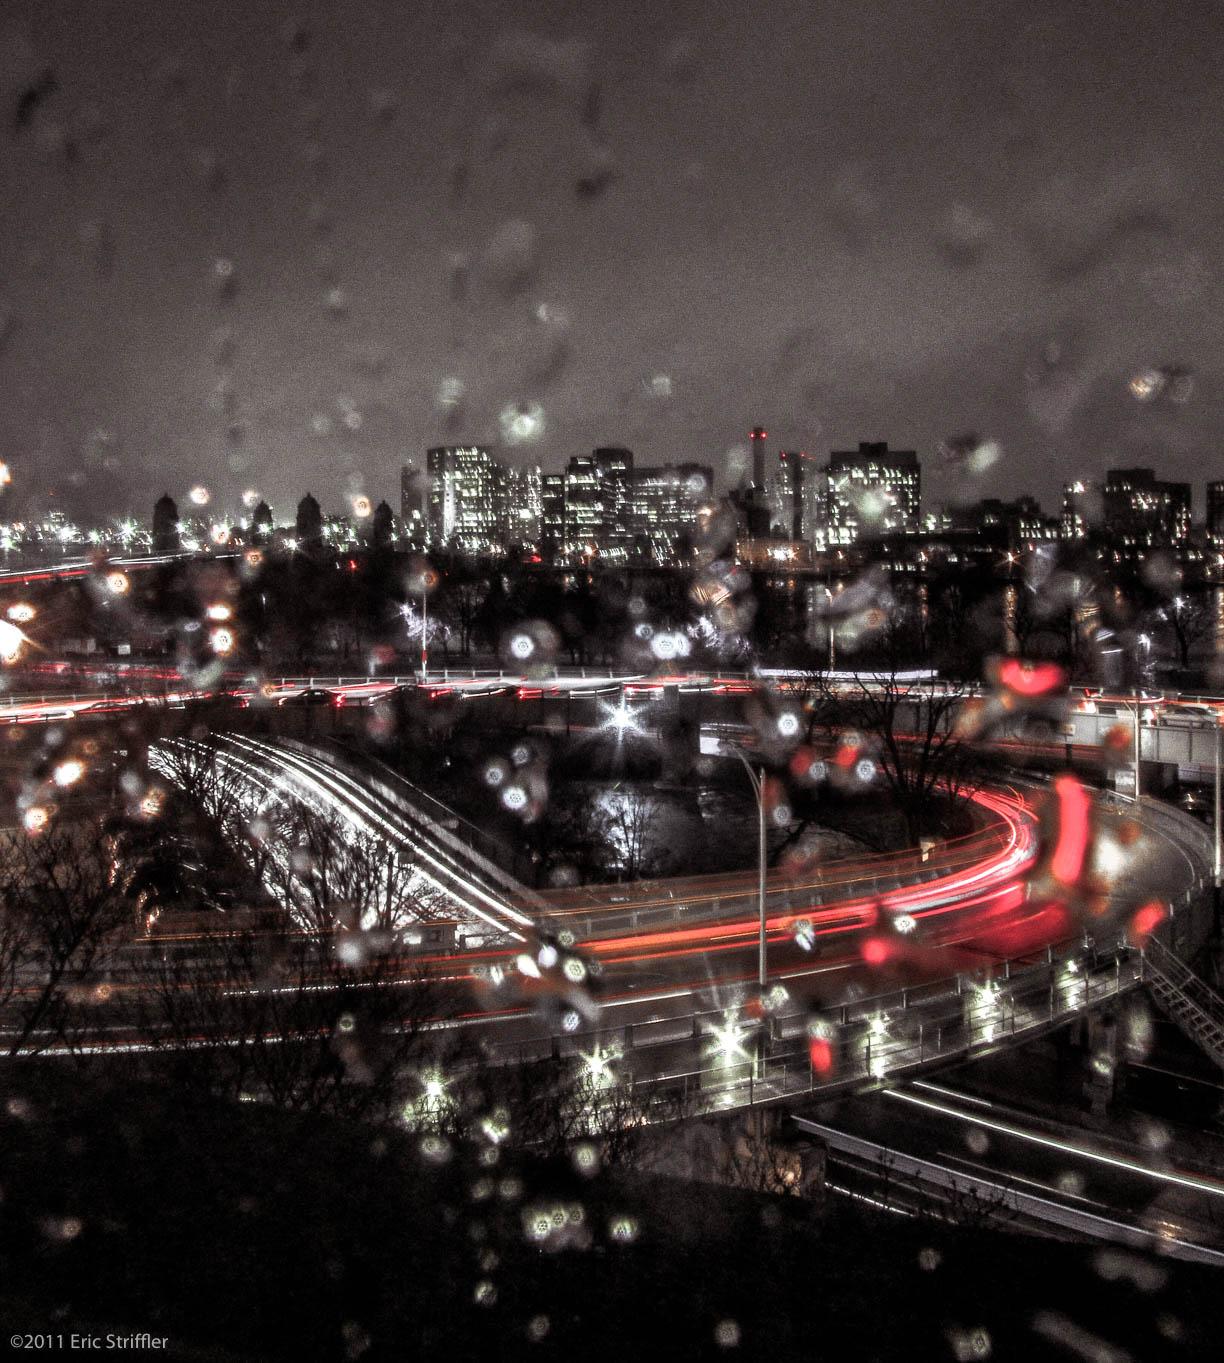 eric_striffler_photography_travel-114.jpg